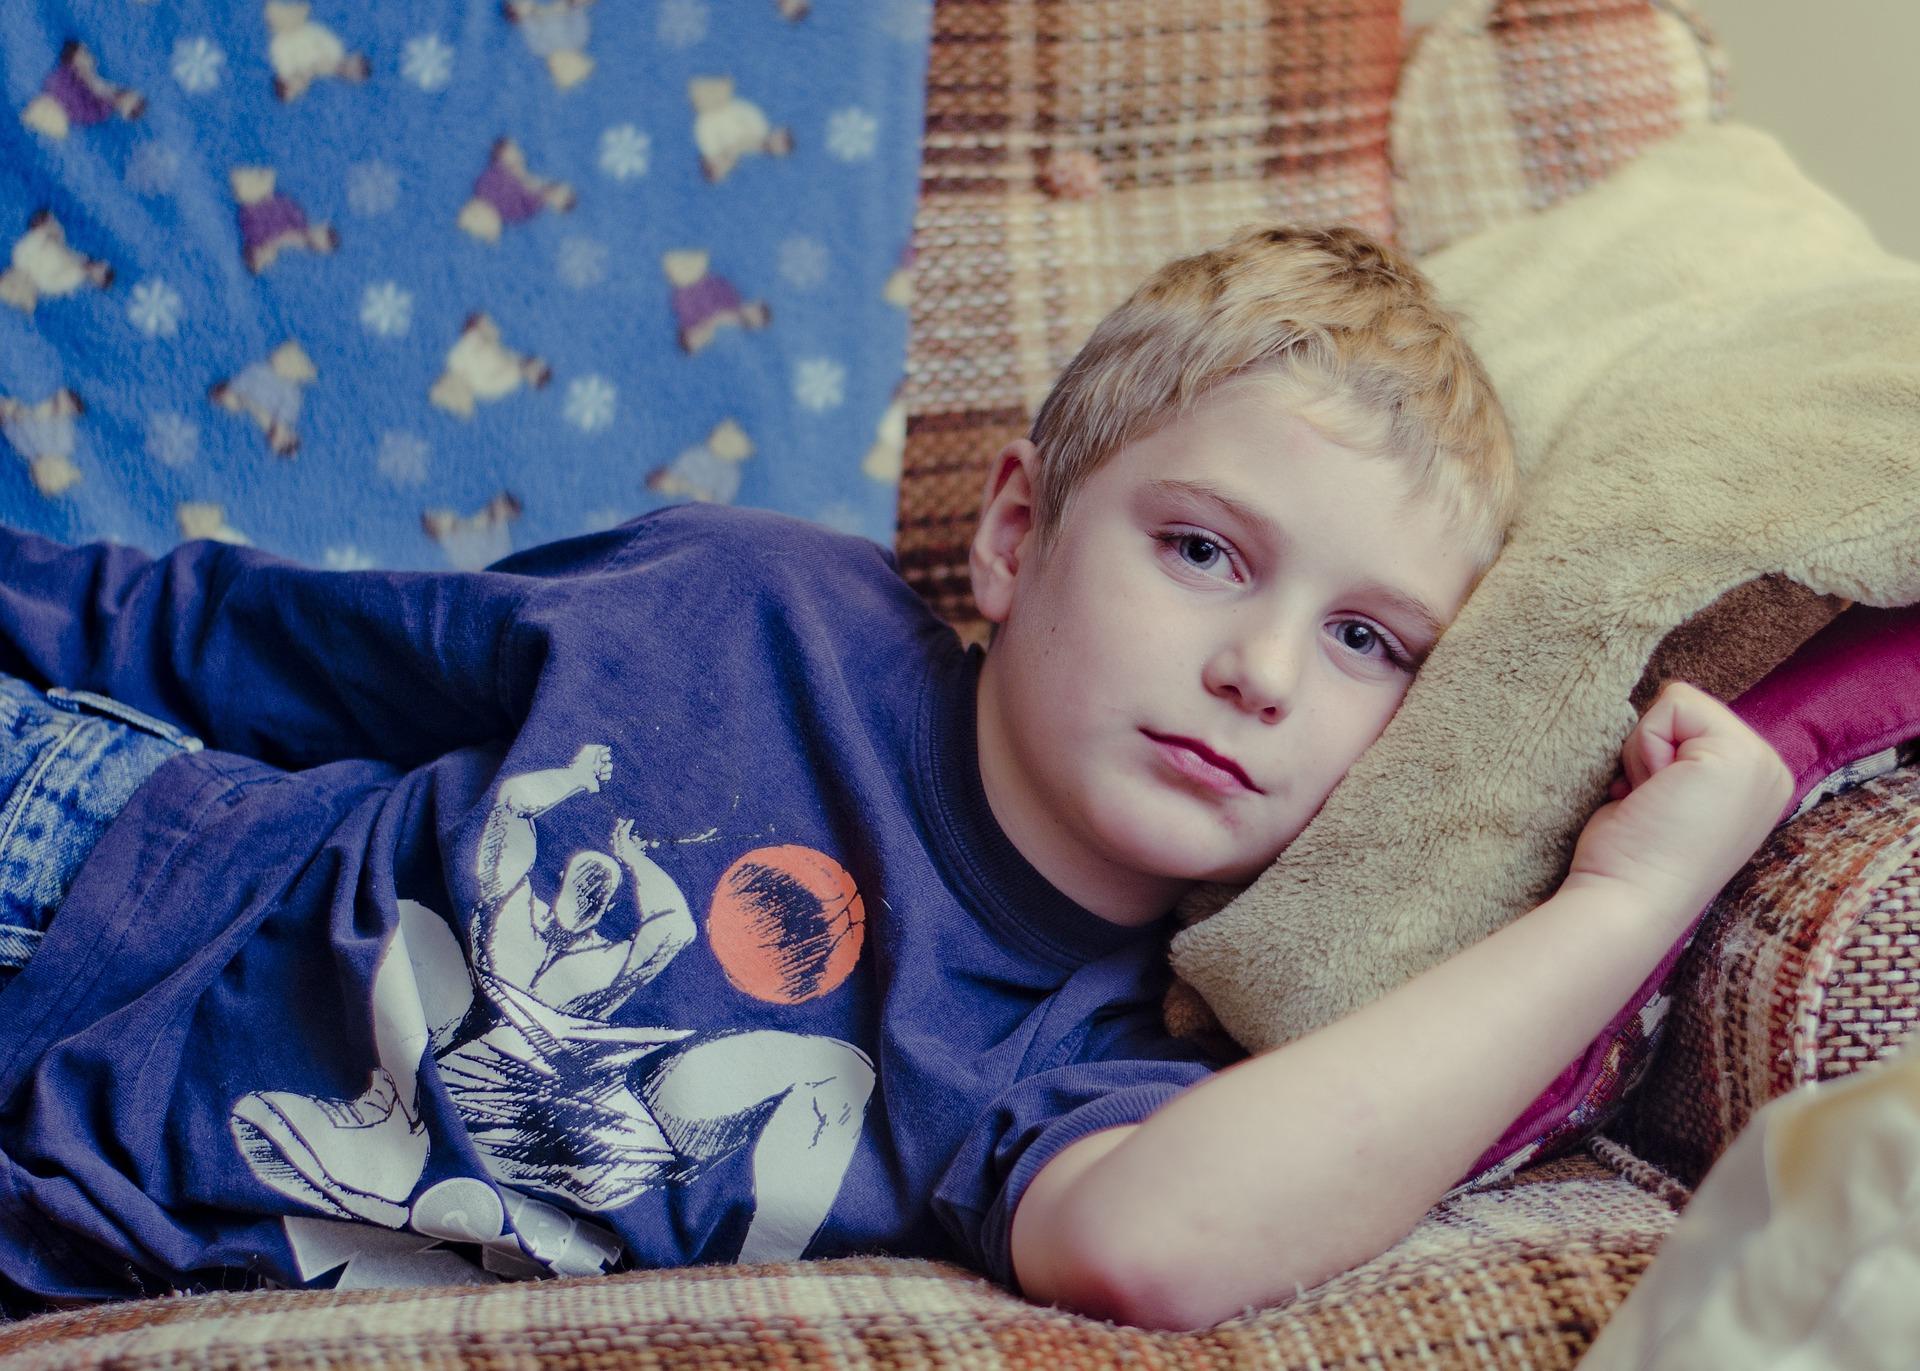 Tusea la copii - sfatulparintilor.ro - pixabay_com - boy-694763_1920